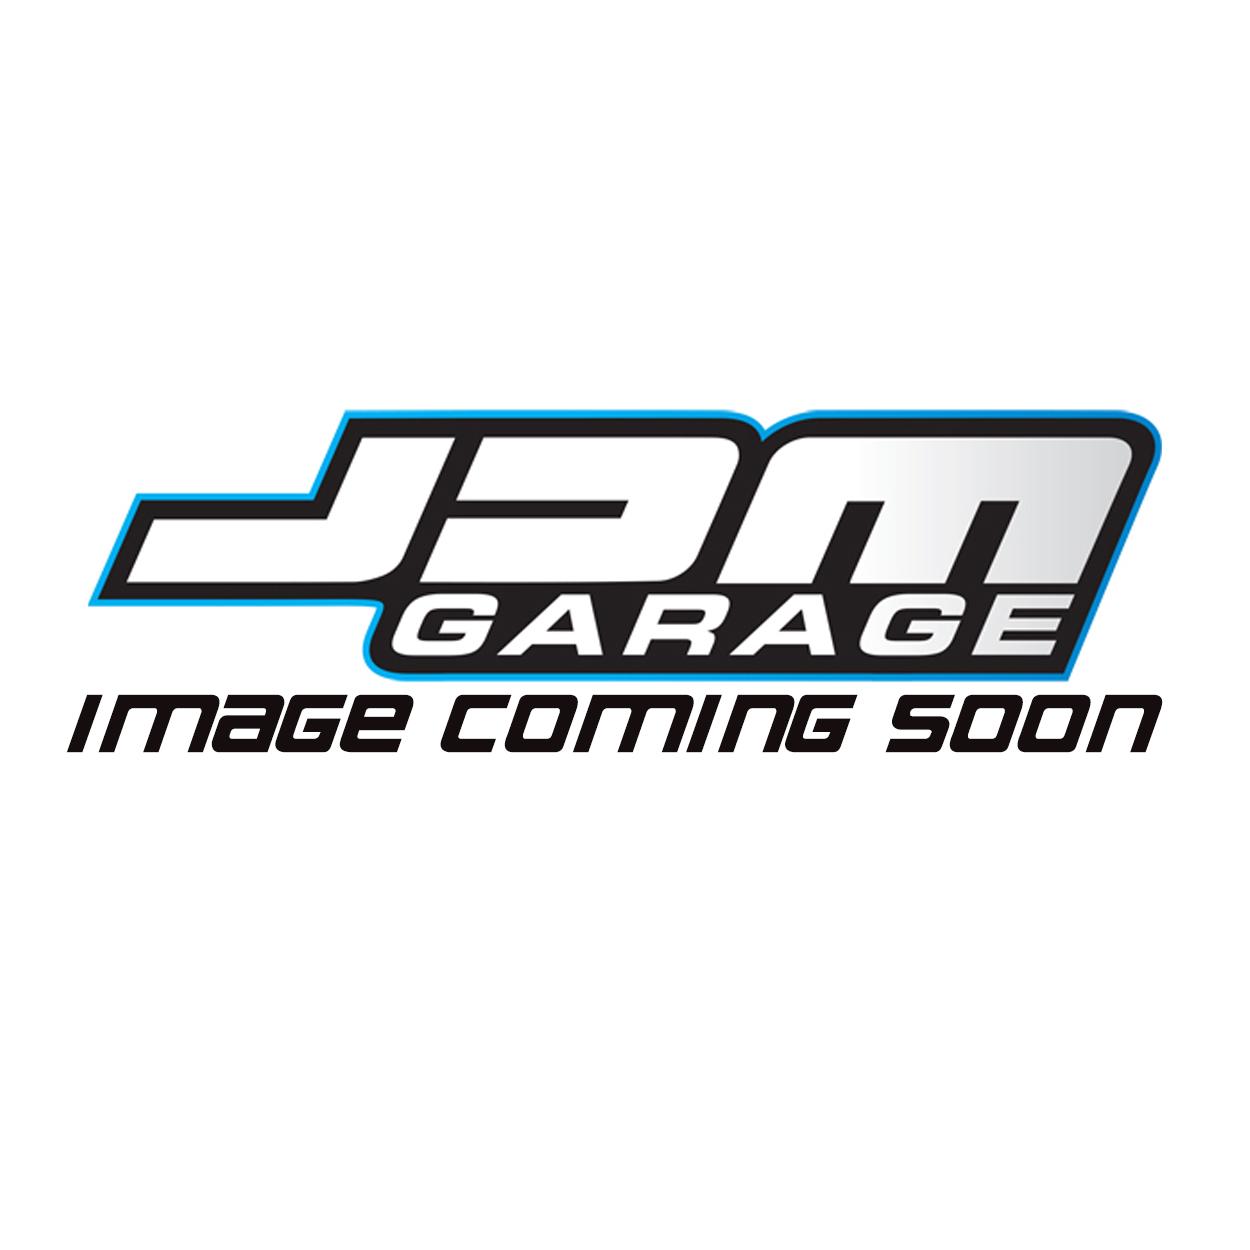 Exedy Clutch Kit Organic / Sport / Race For Subaru GC8 / GDB / GH8 / GRB